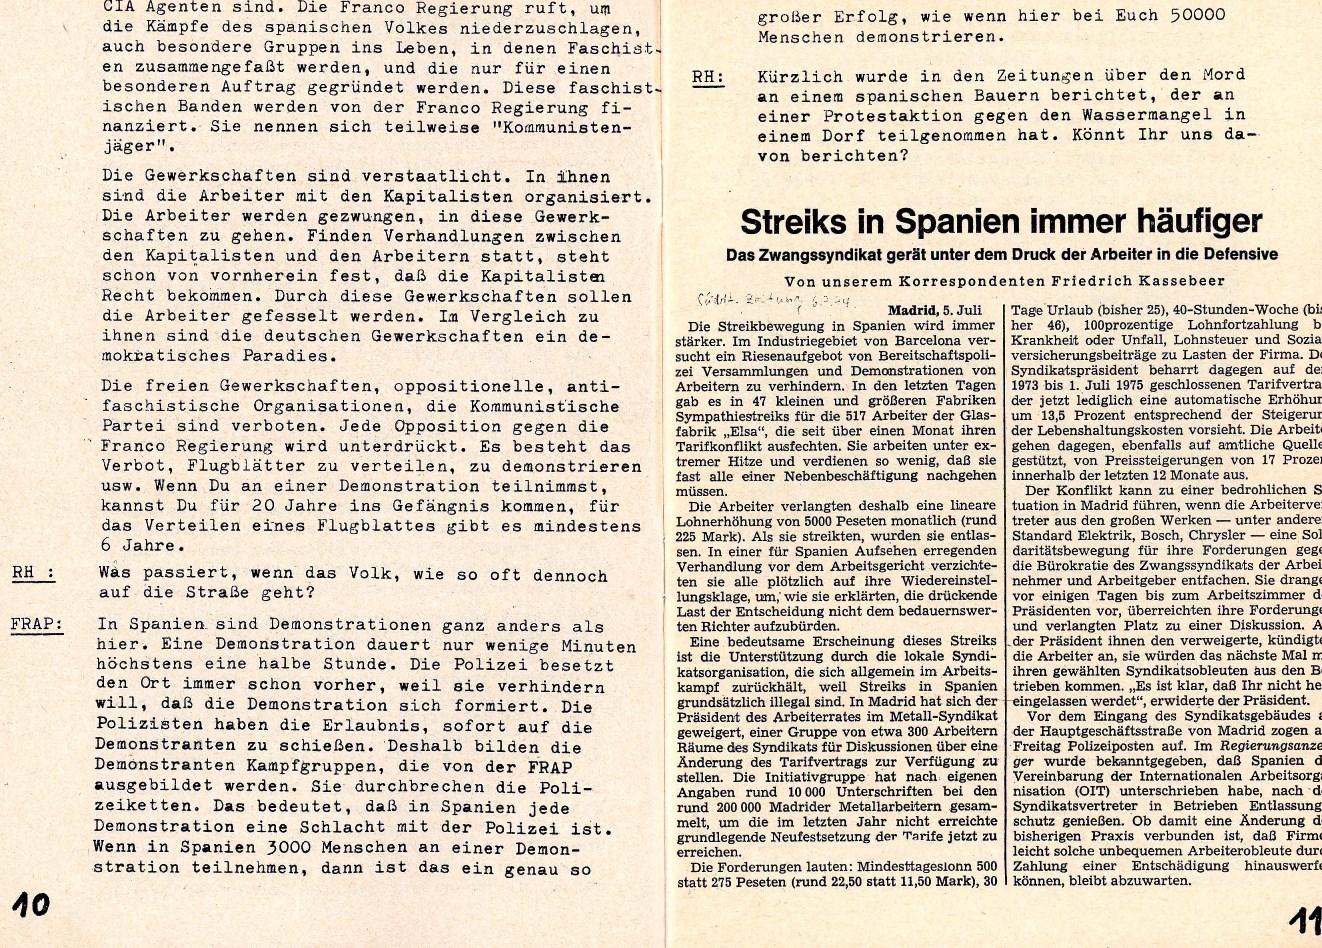 RHD_1974_Spanien_06